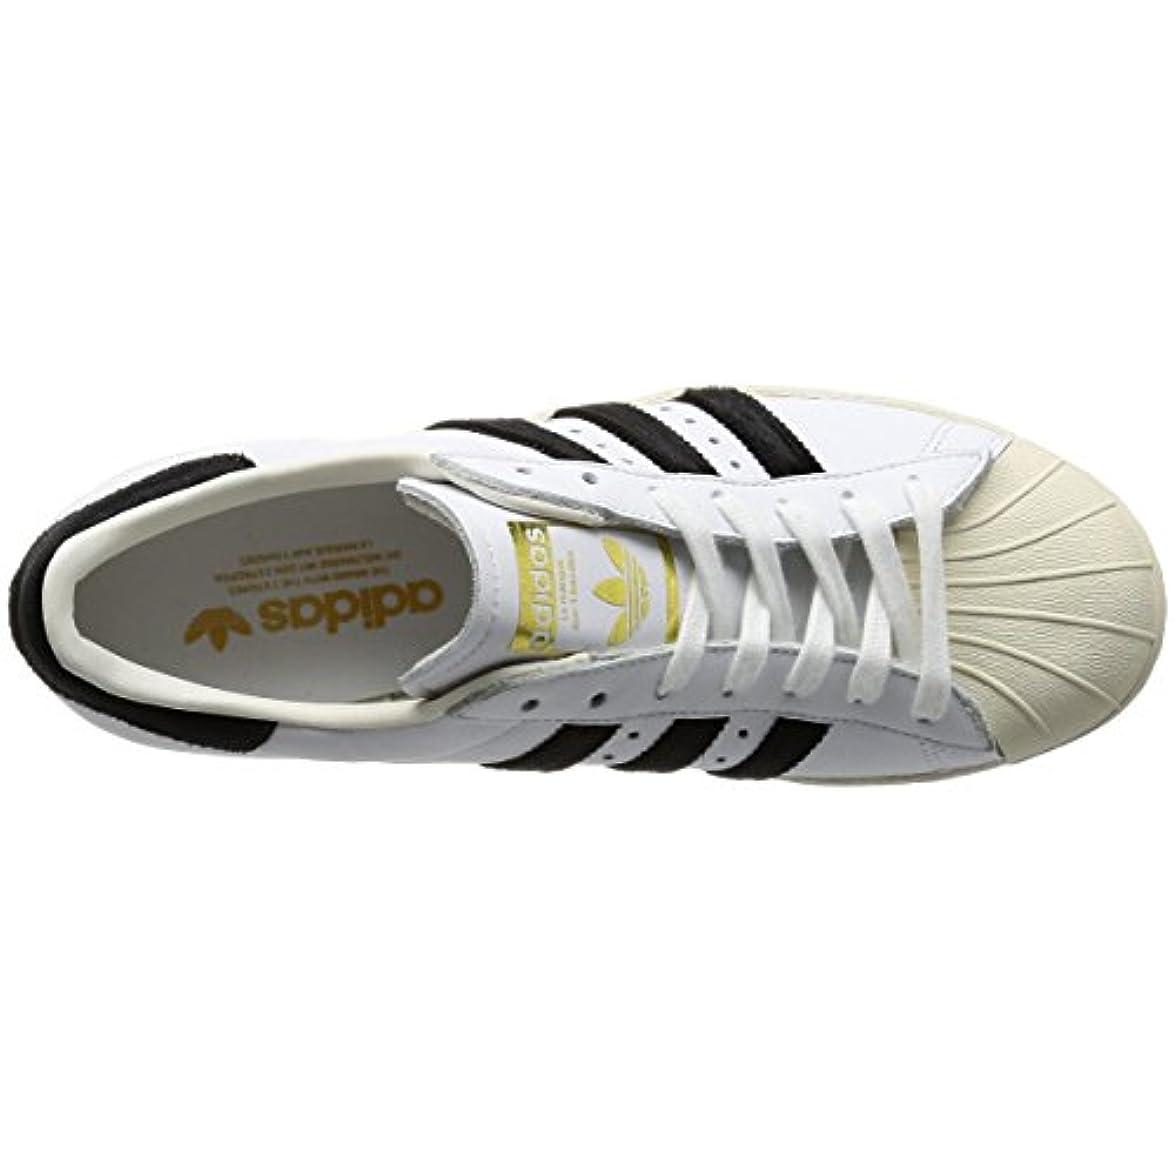 Sneaker Adidas Superstar 80s